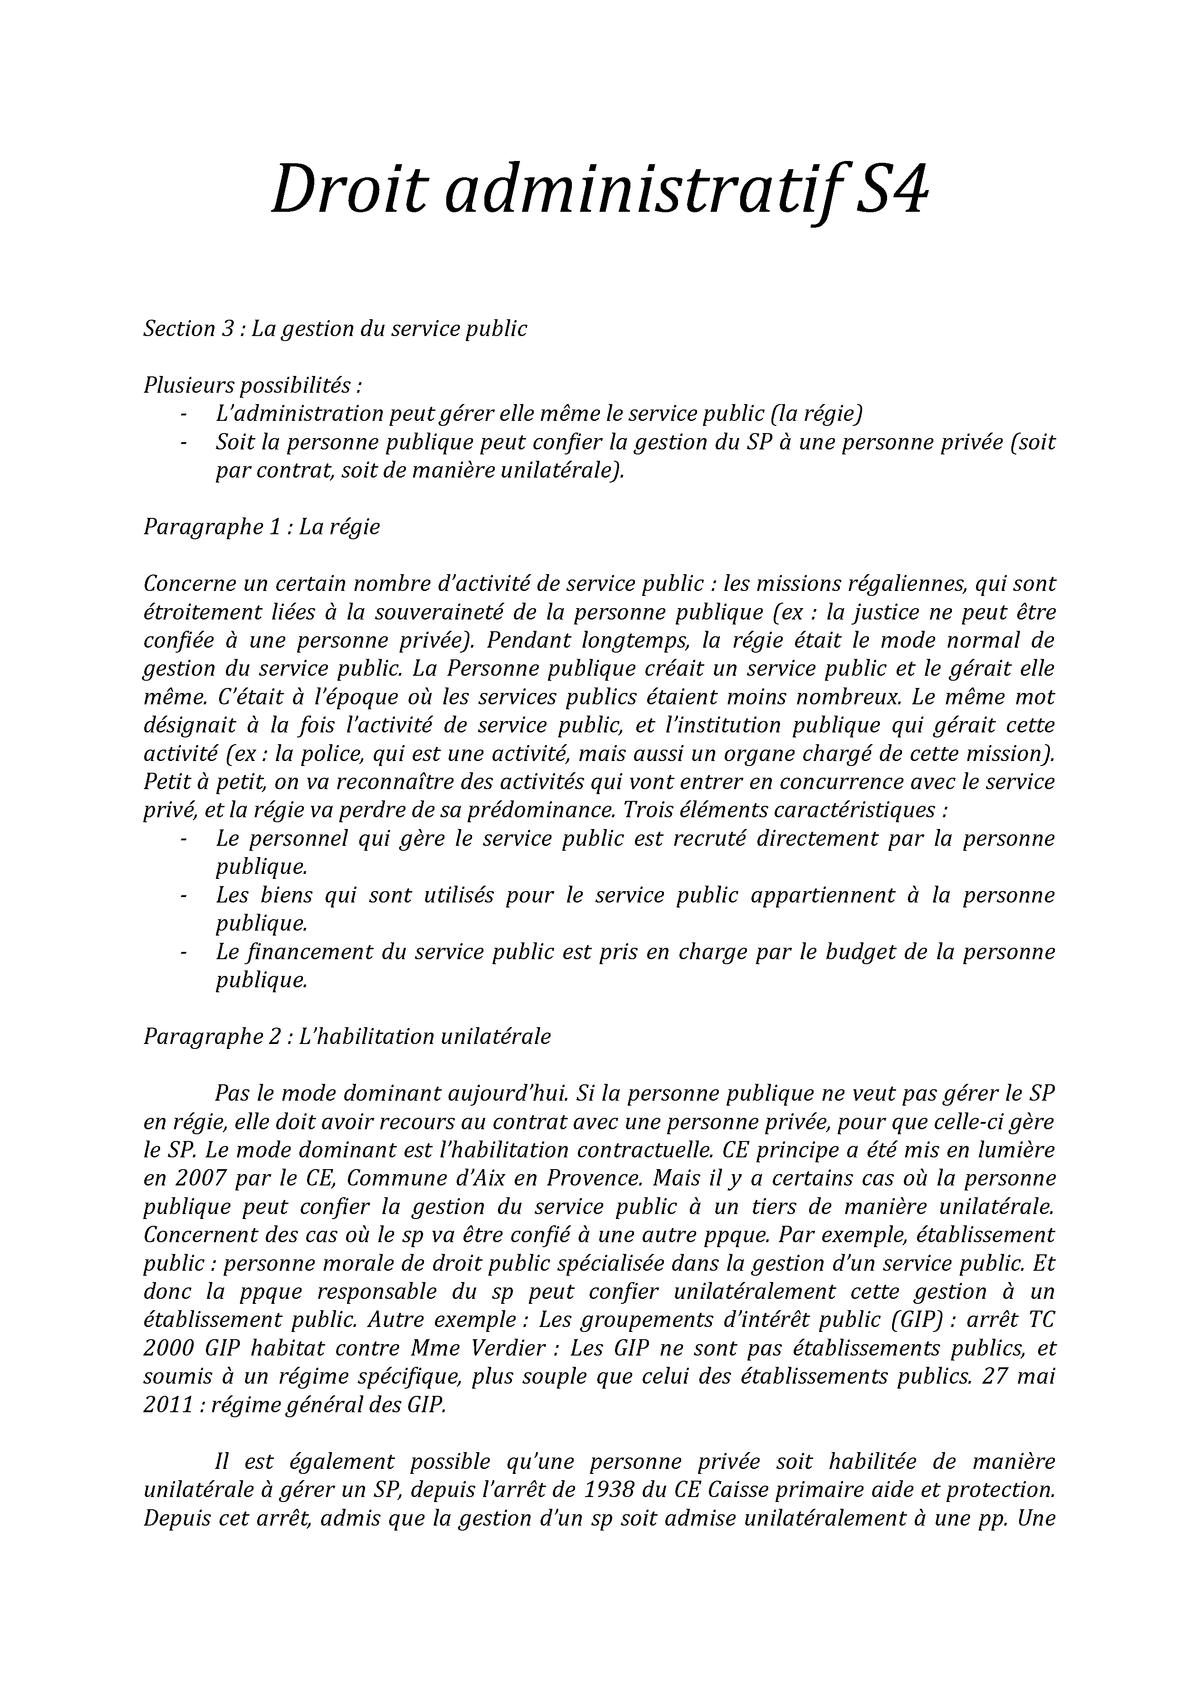 Droit administratif S4 - Droit administratif - StuDocu